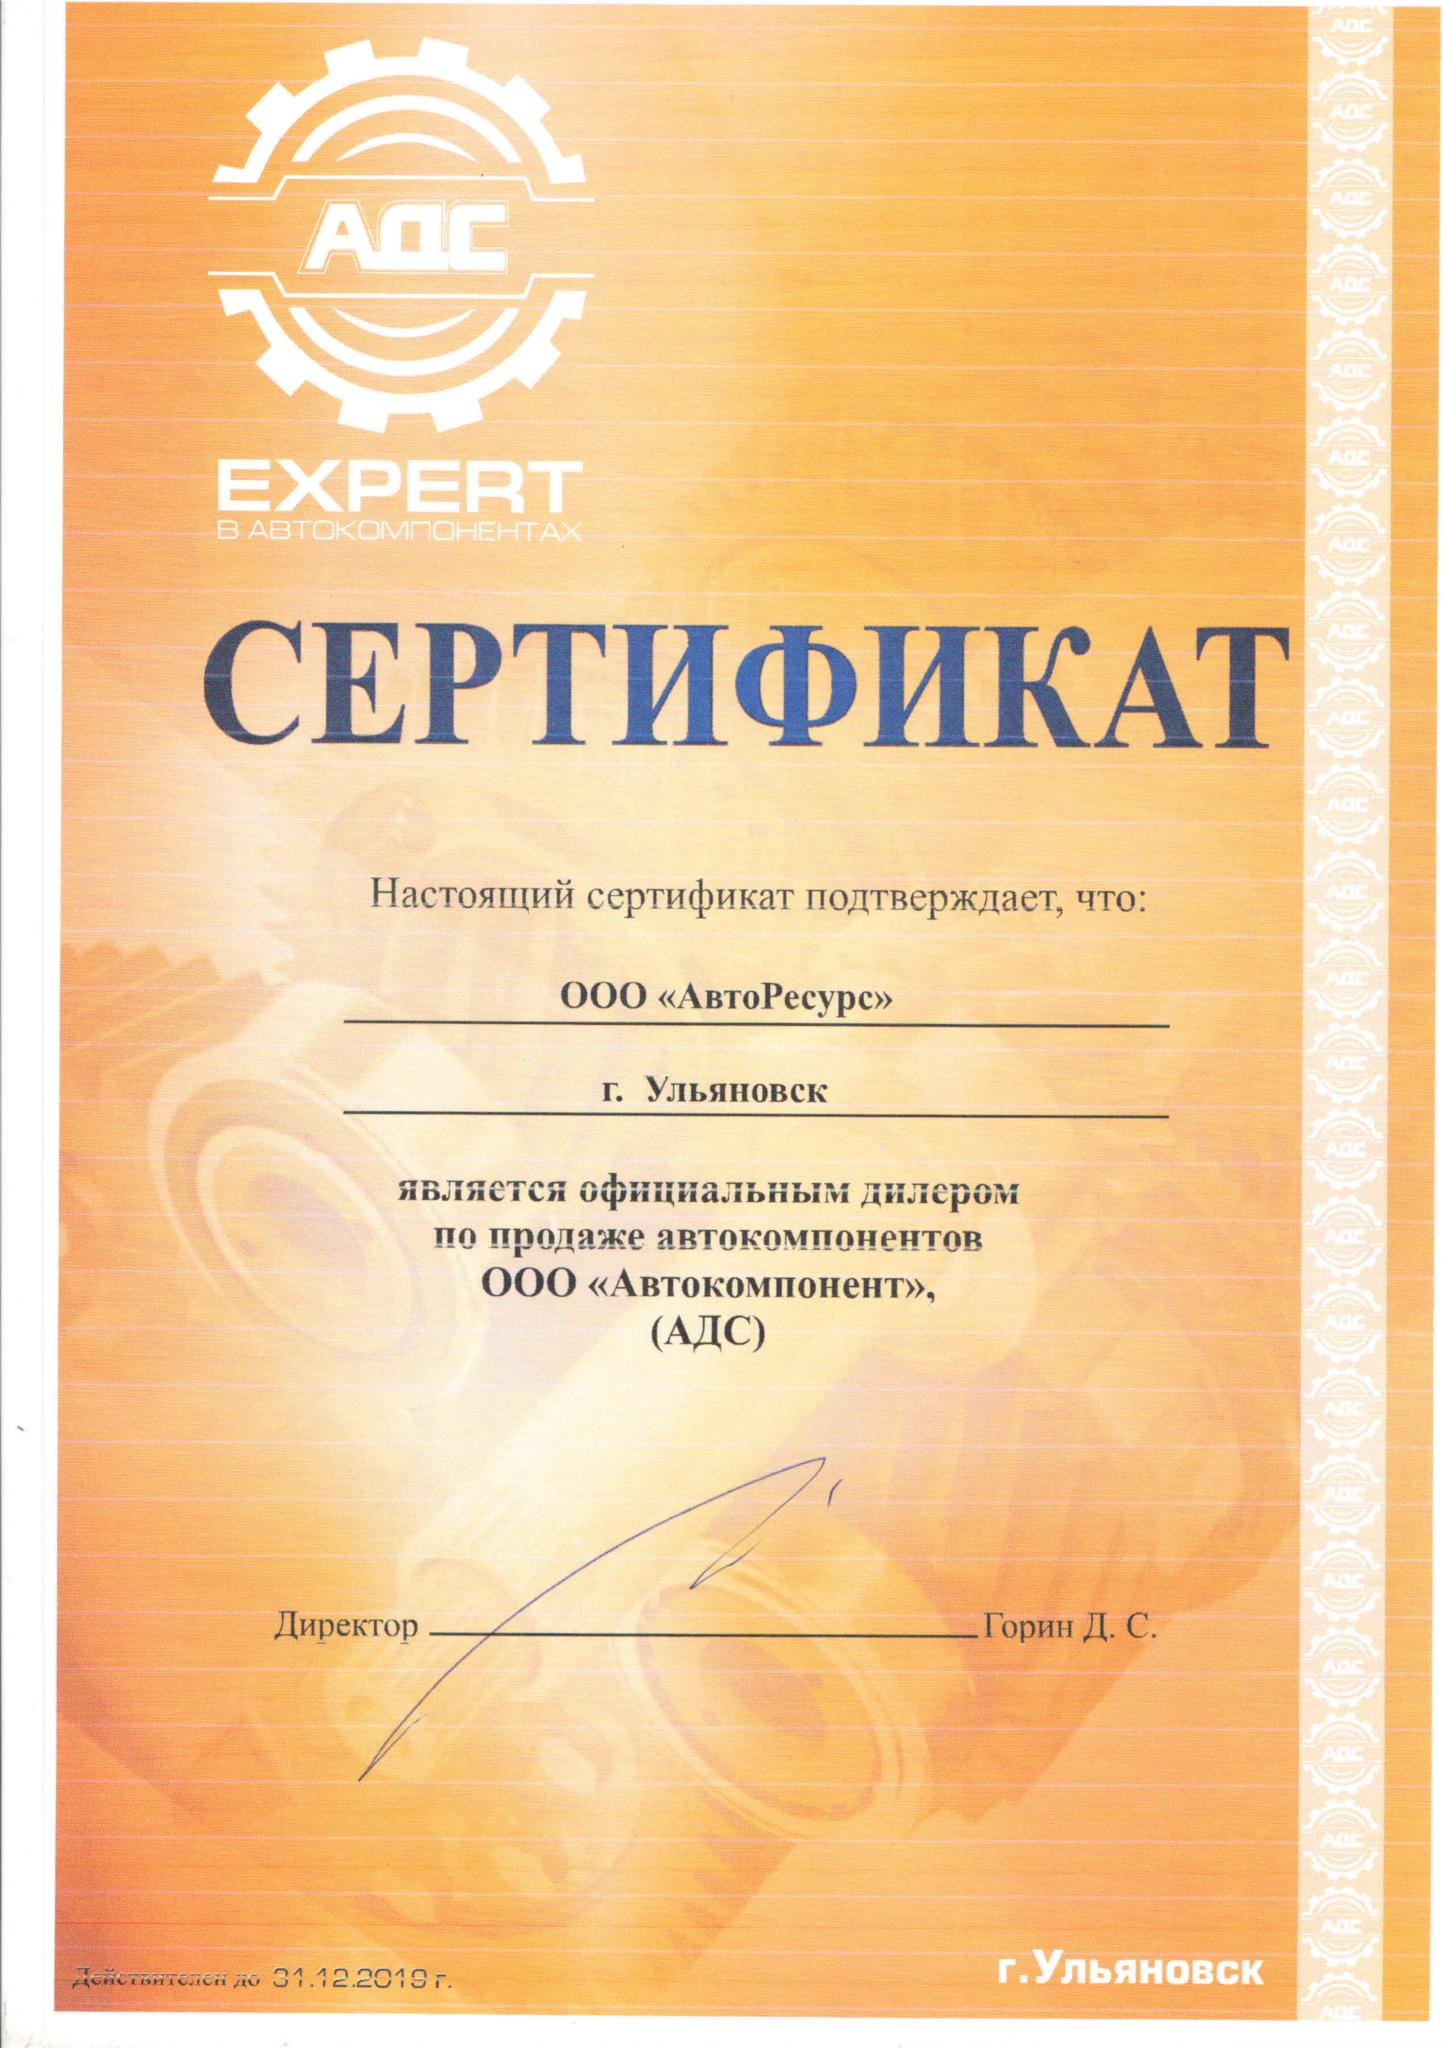 сертификат дилера АДС